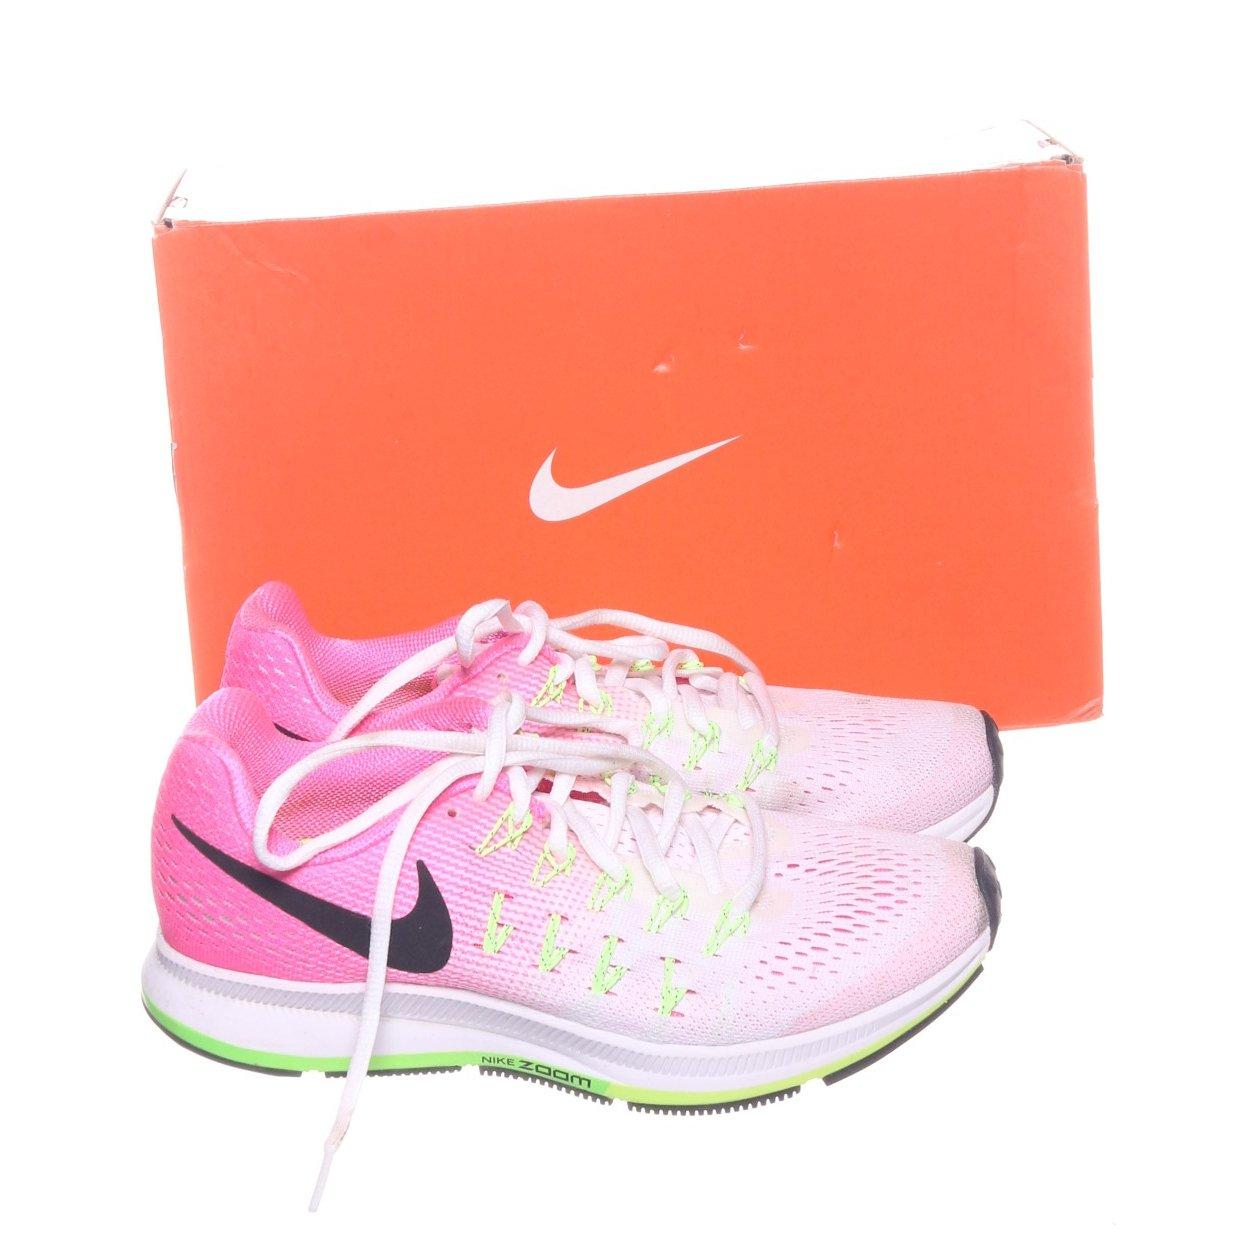 brand new 3df4b 532f0 Nike, Löparskor, Strl  36,5, Zoom Pegasus 33, Vit